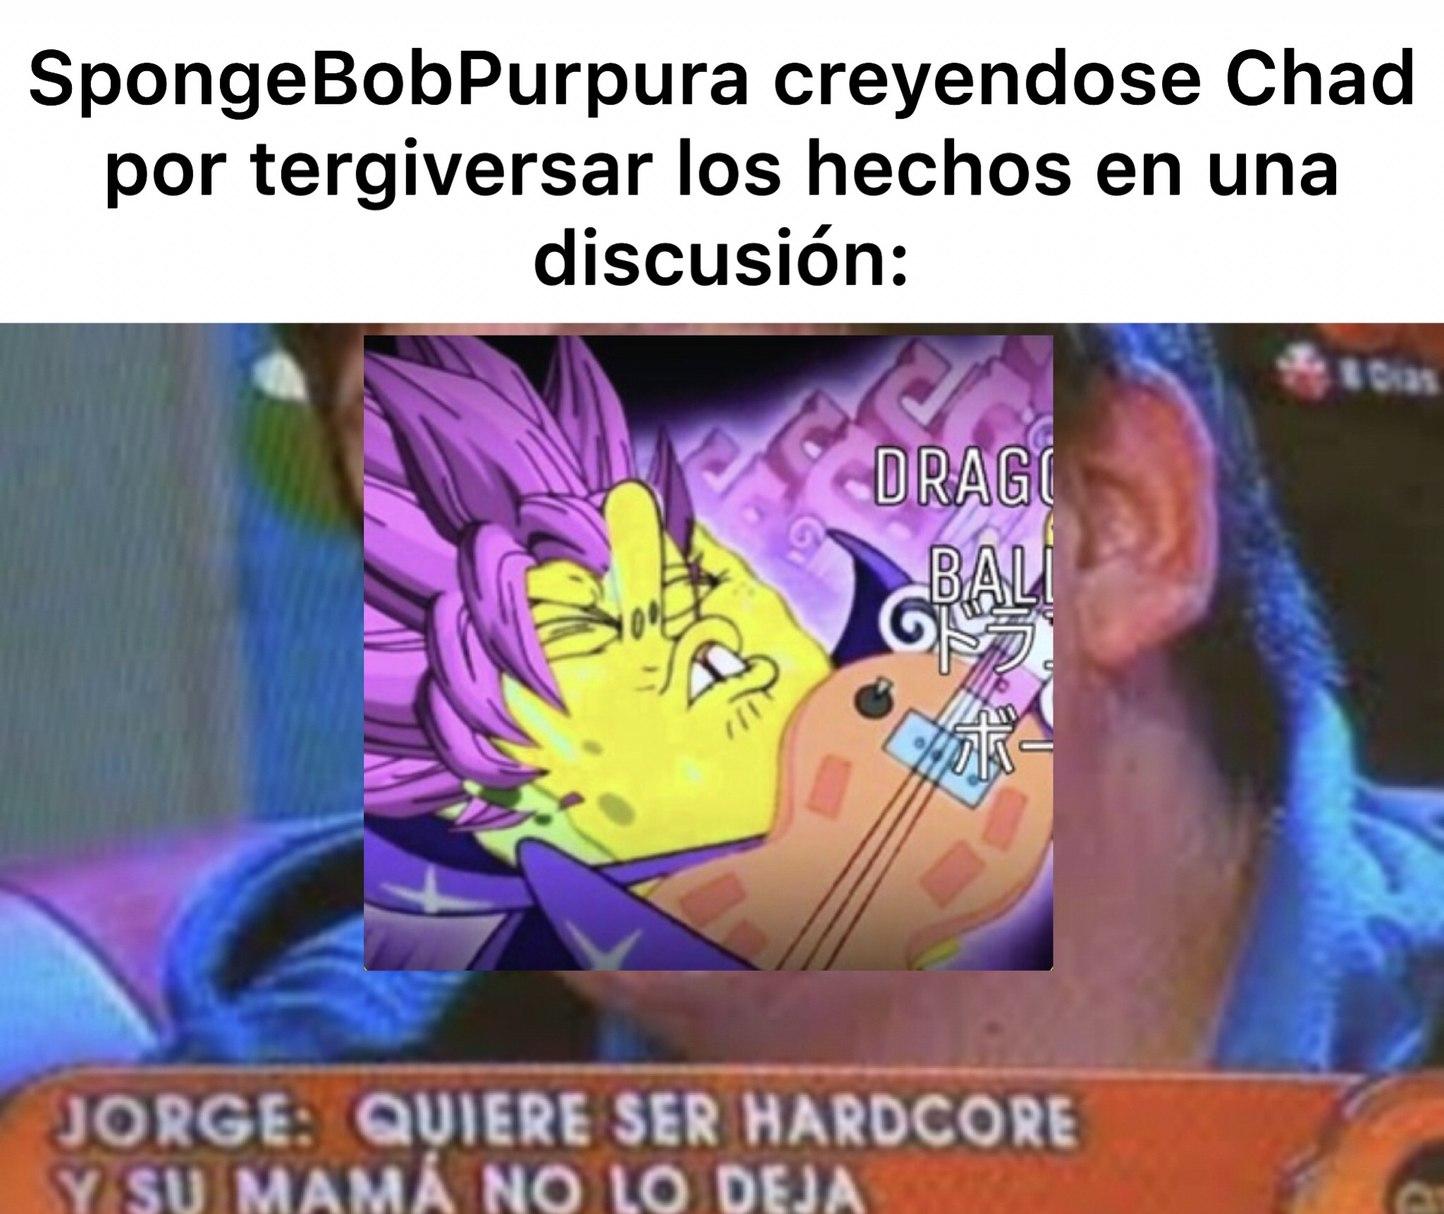 SpongeSoyUnaDecepcionBobPurpura - meme